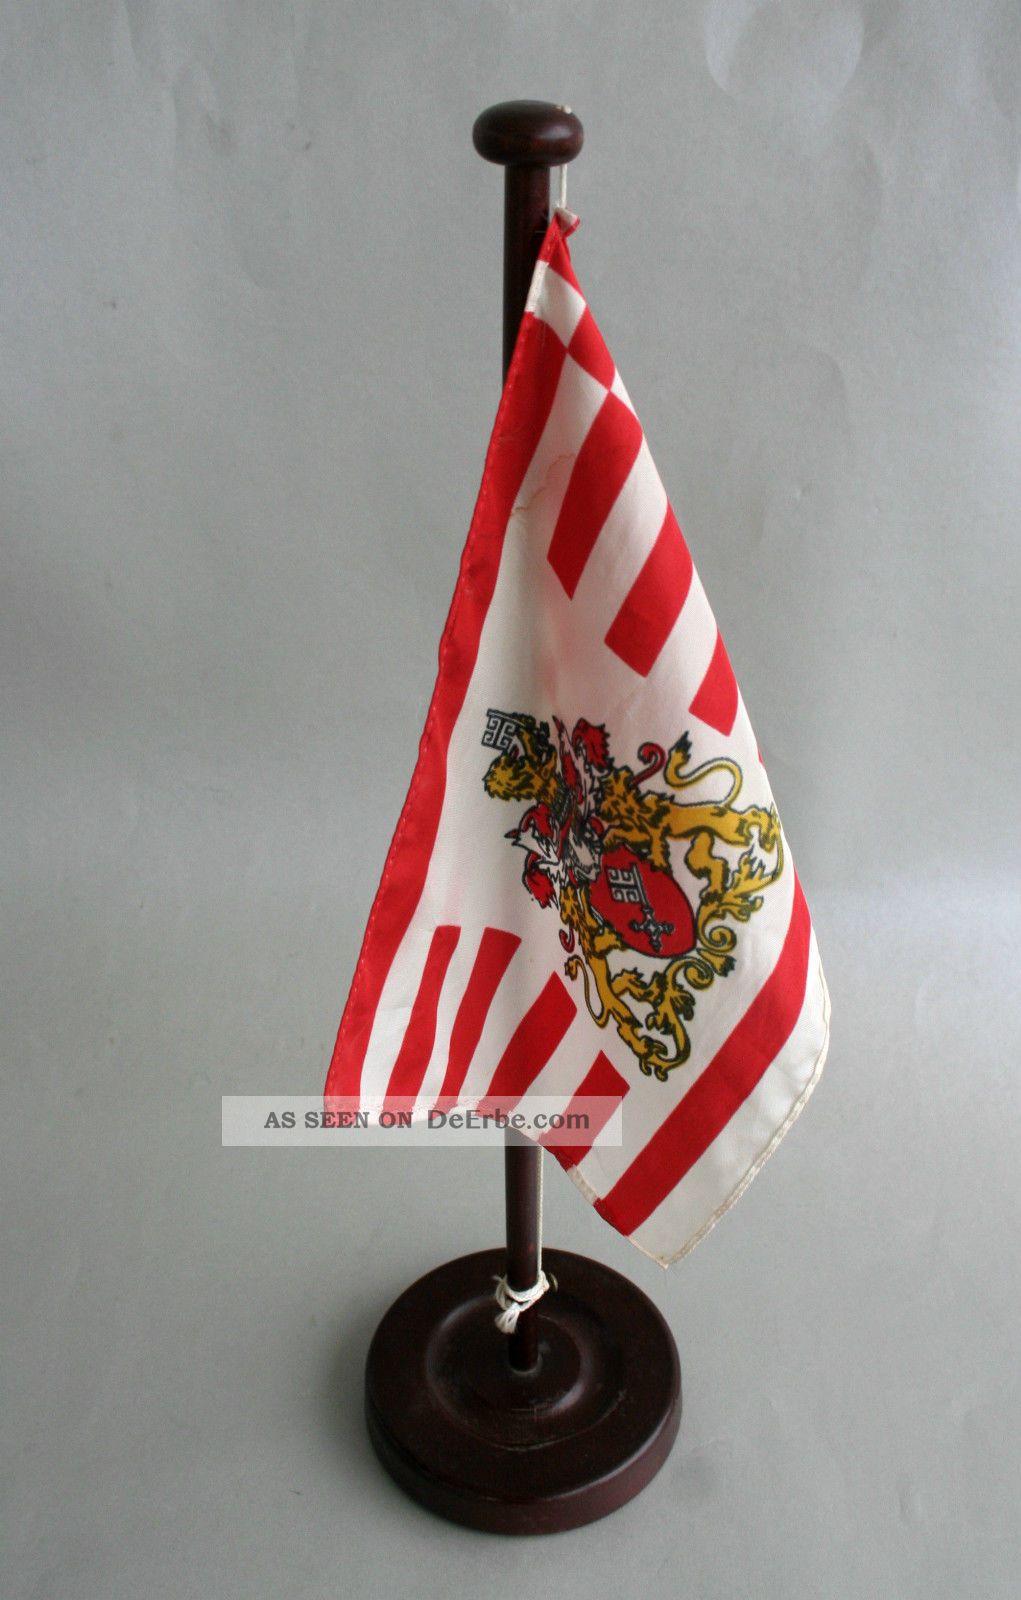 tischflagge staatsflagge bremen senatsflagge h 43cm flagge. Black Bedroom Furniture Sets. Home Design Ideas